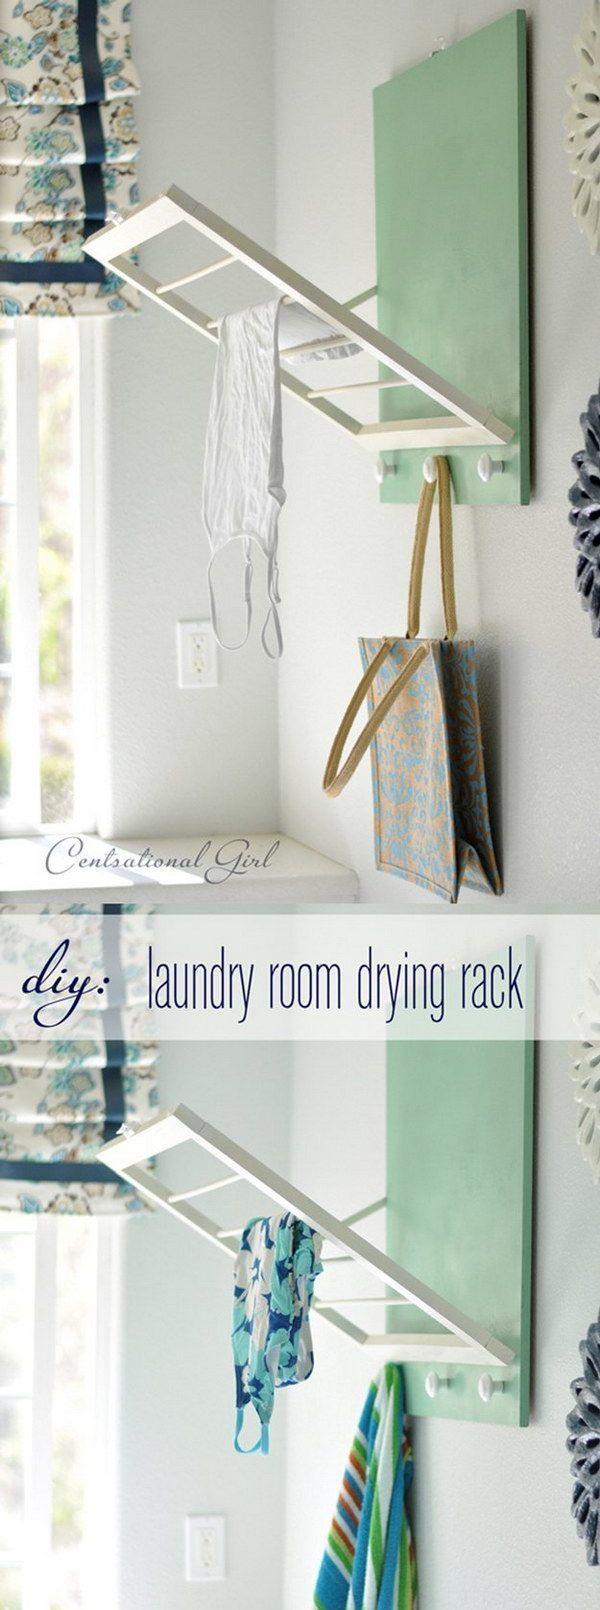 Best 25+ Small laundry closet ideas on Pinterest